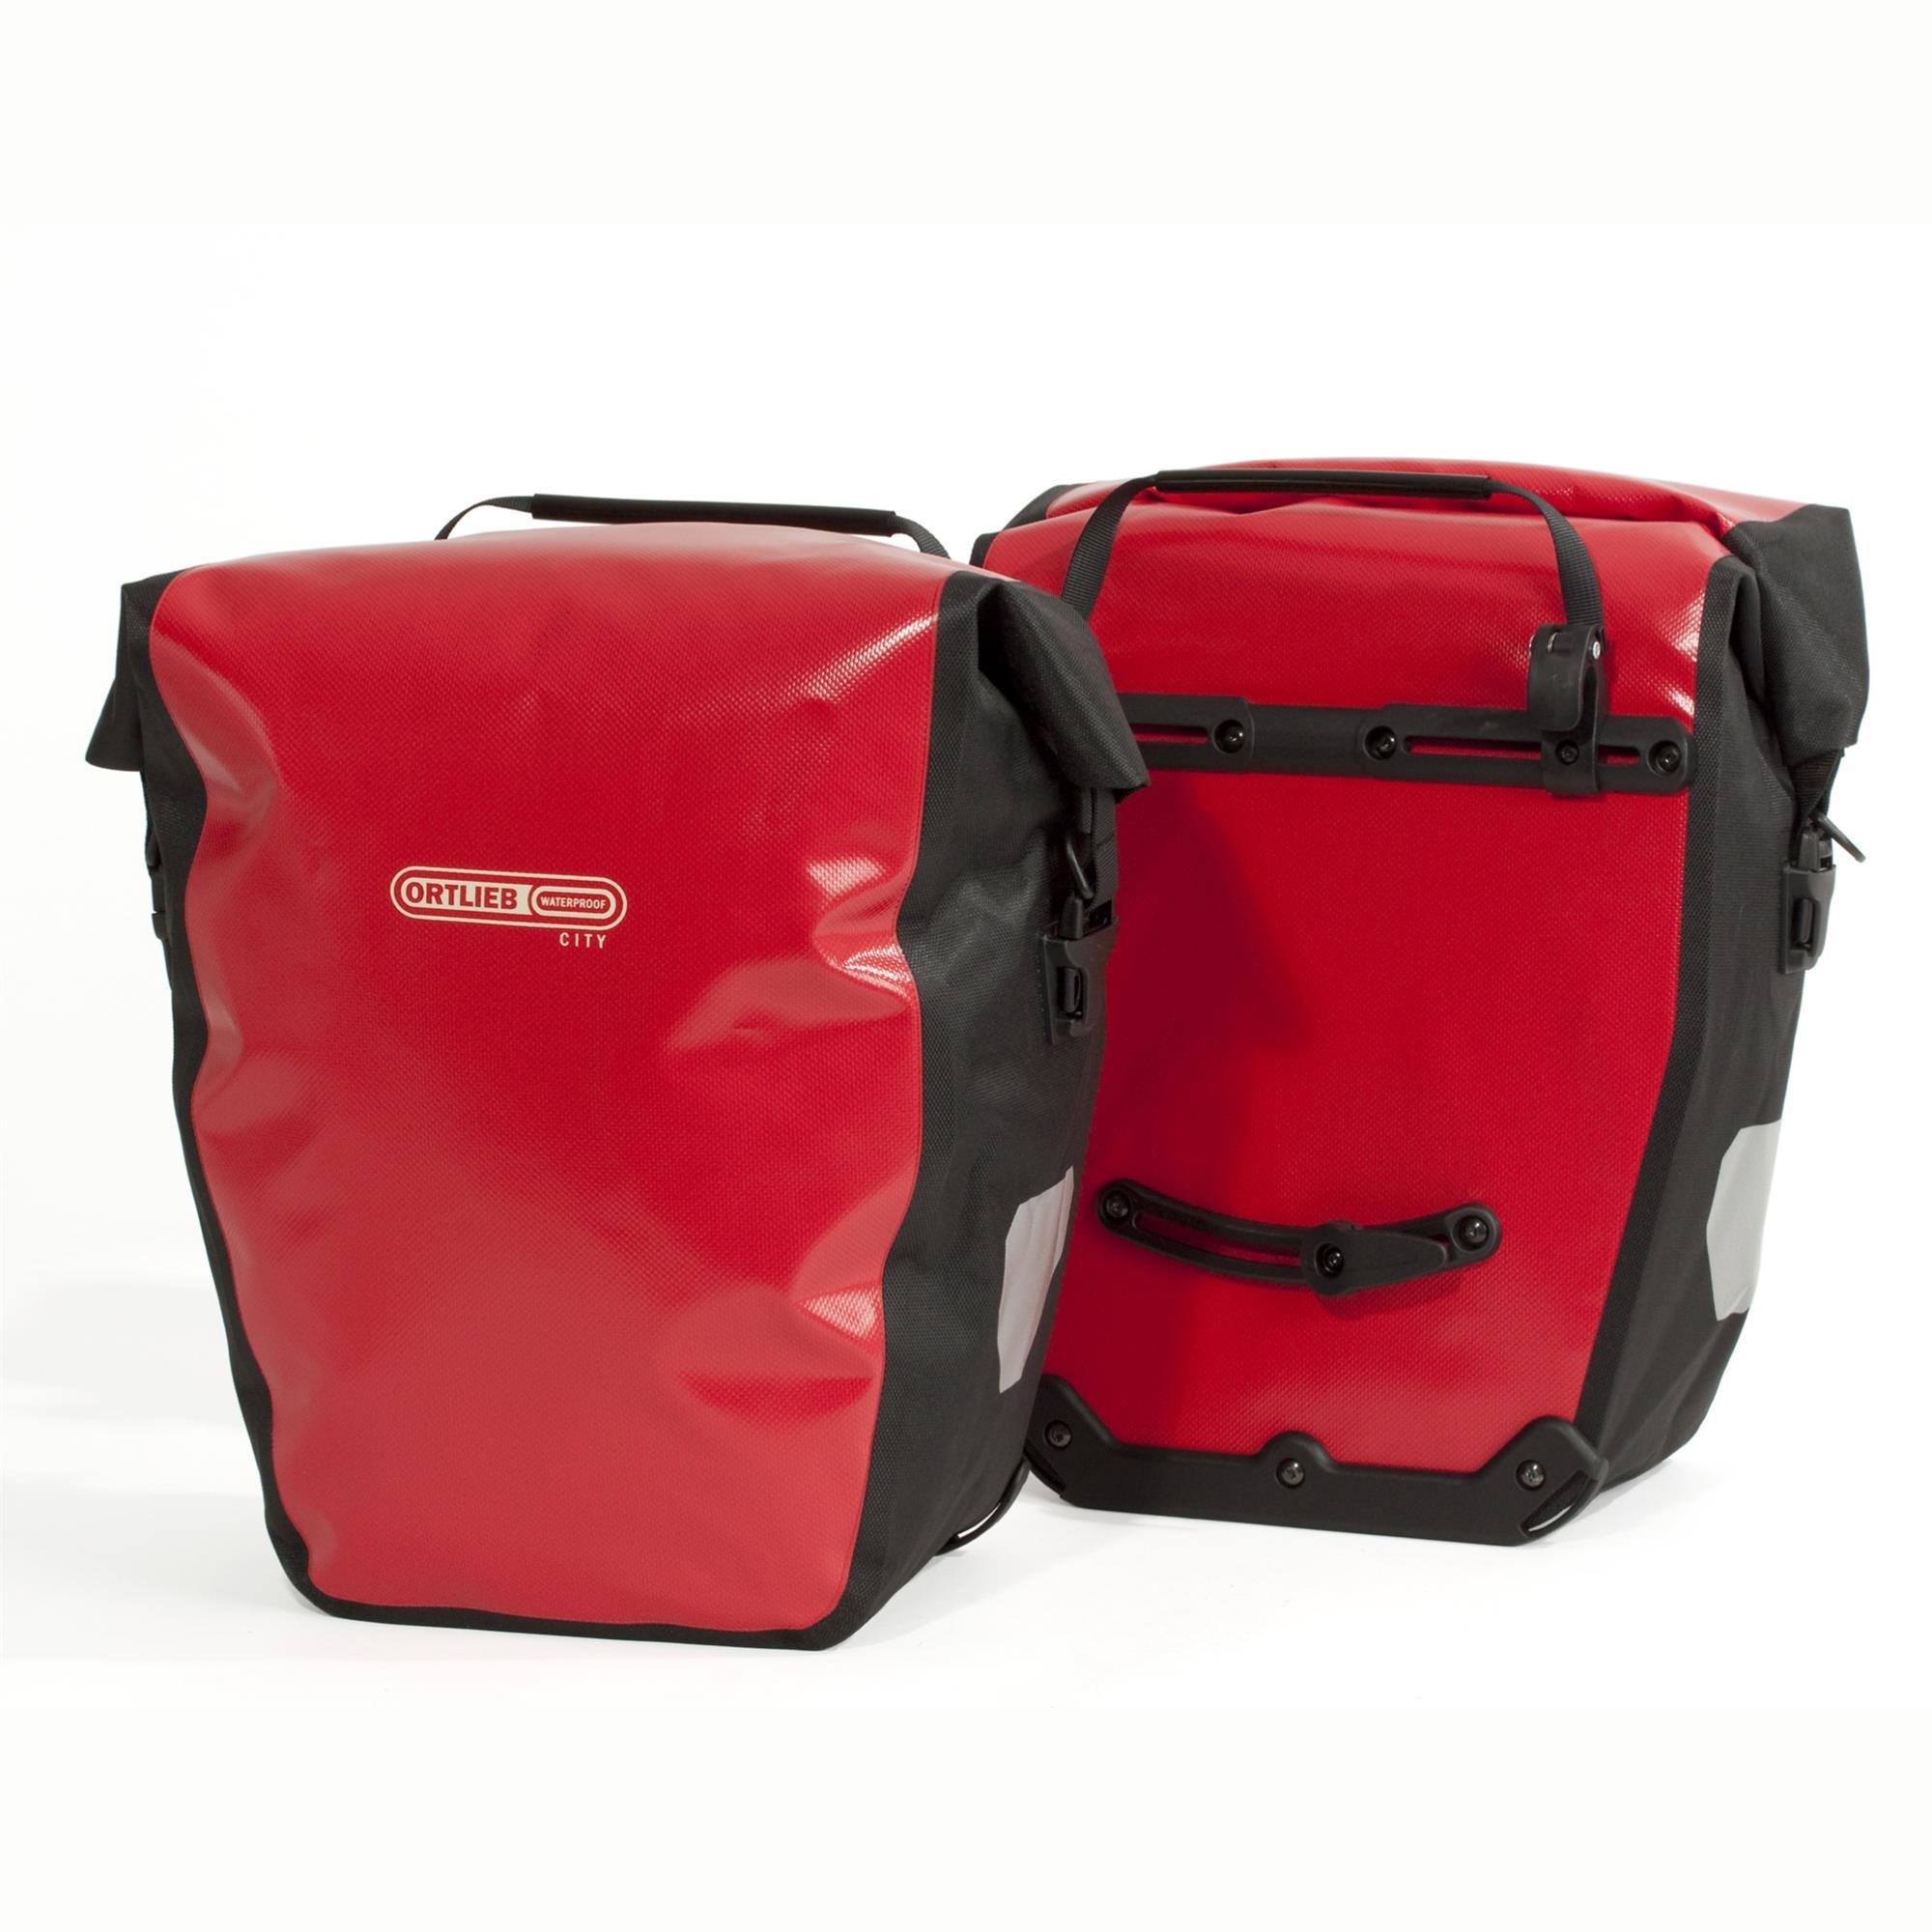 Ortlieb Back-Roller City Fahrradtasche rot/schwarz